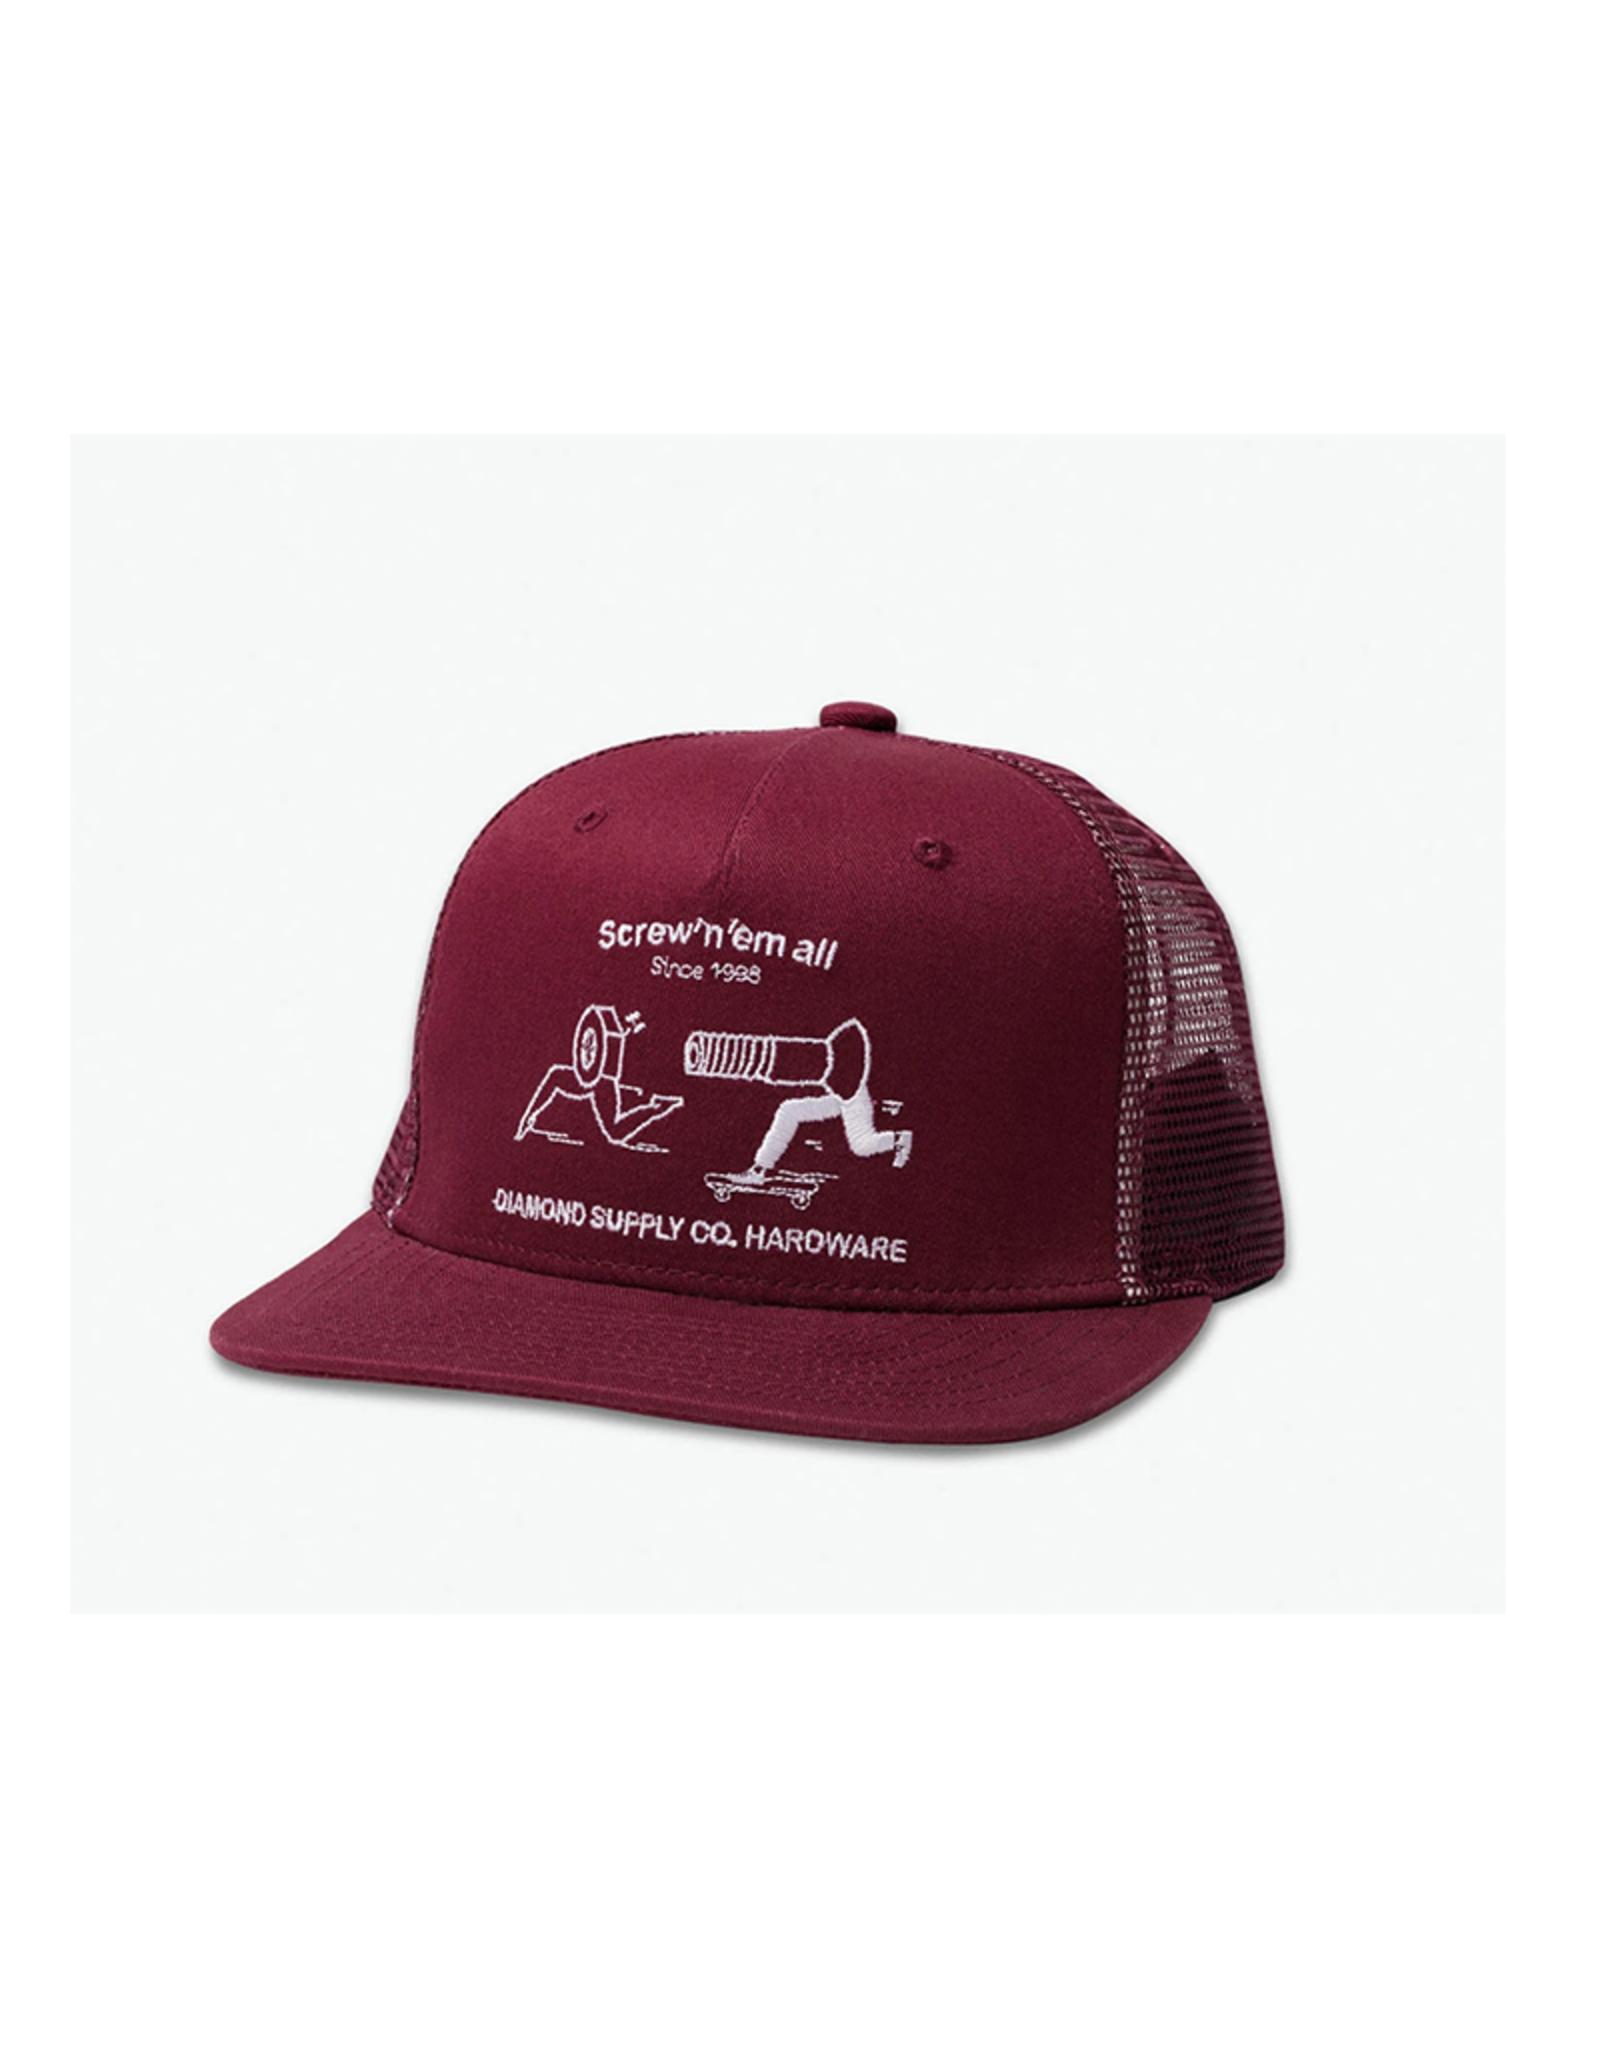 Diamond Supply Co. Diamond Supply SCREW 'EM ALL Trucker Hat